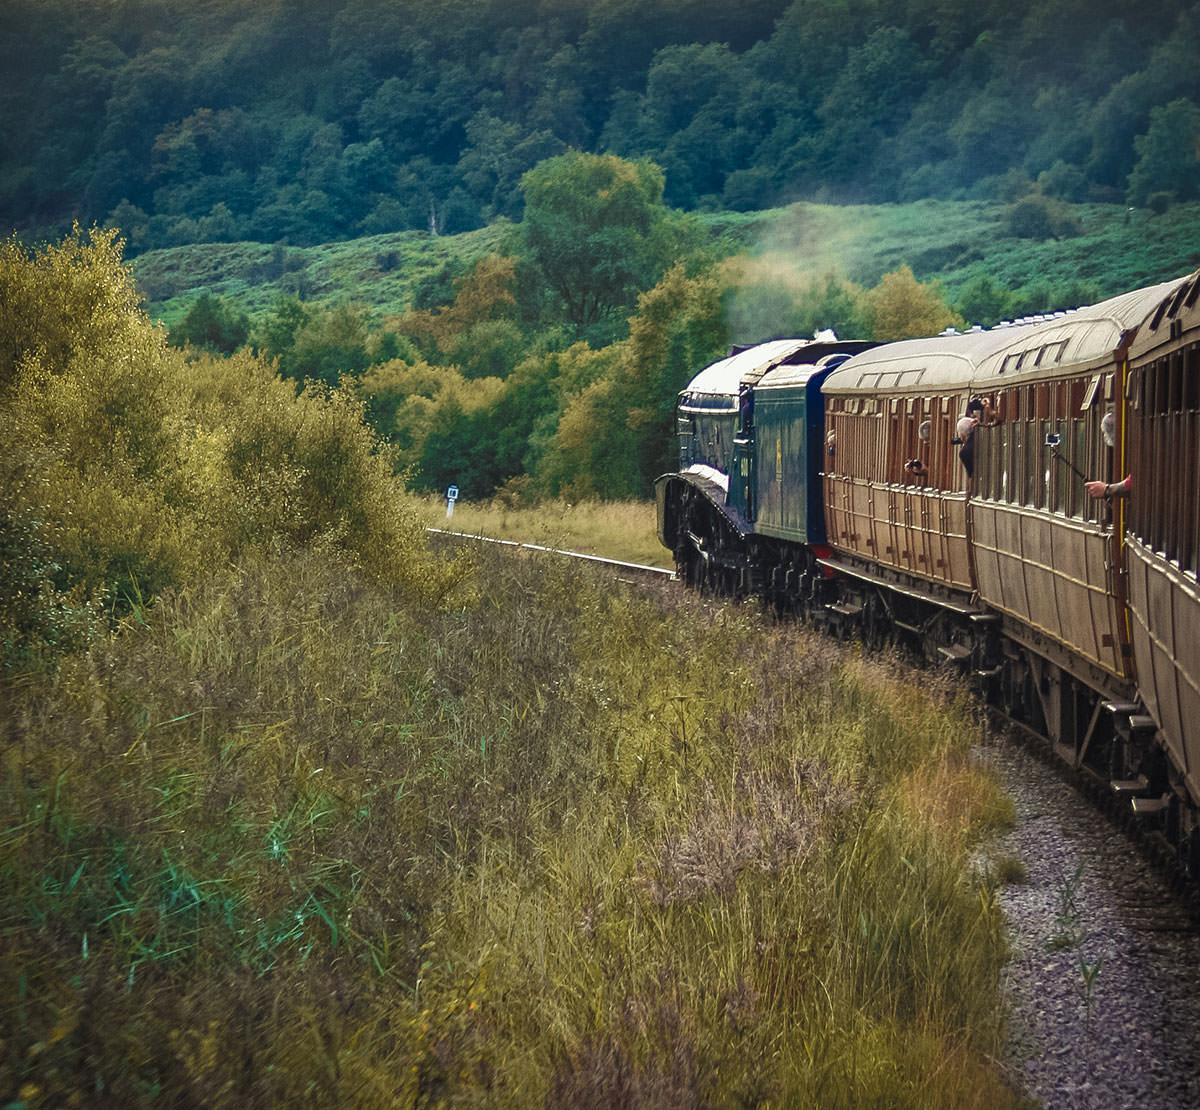 September-NYMR-Nigel-Gresley-A4-Trains-140